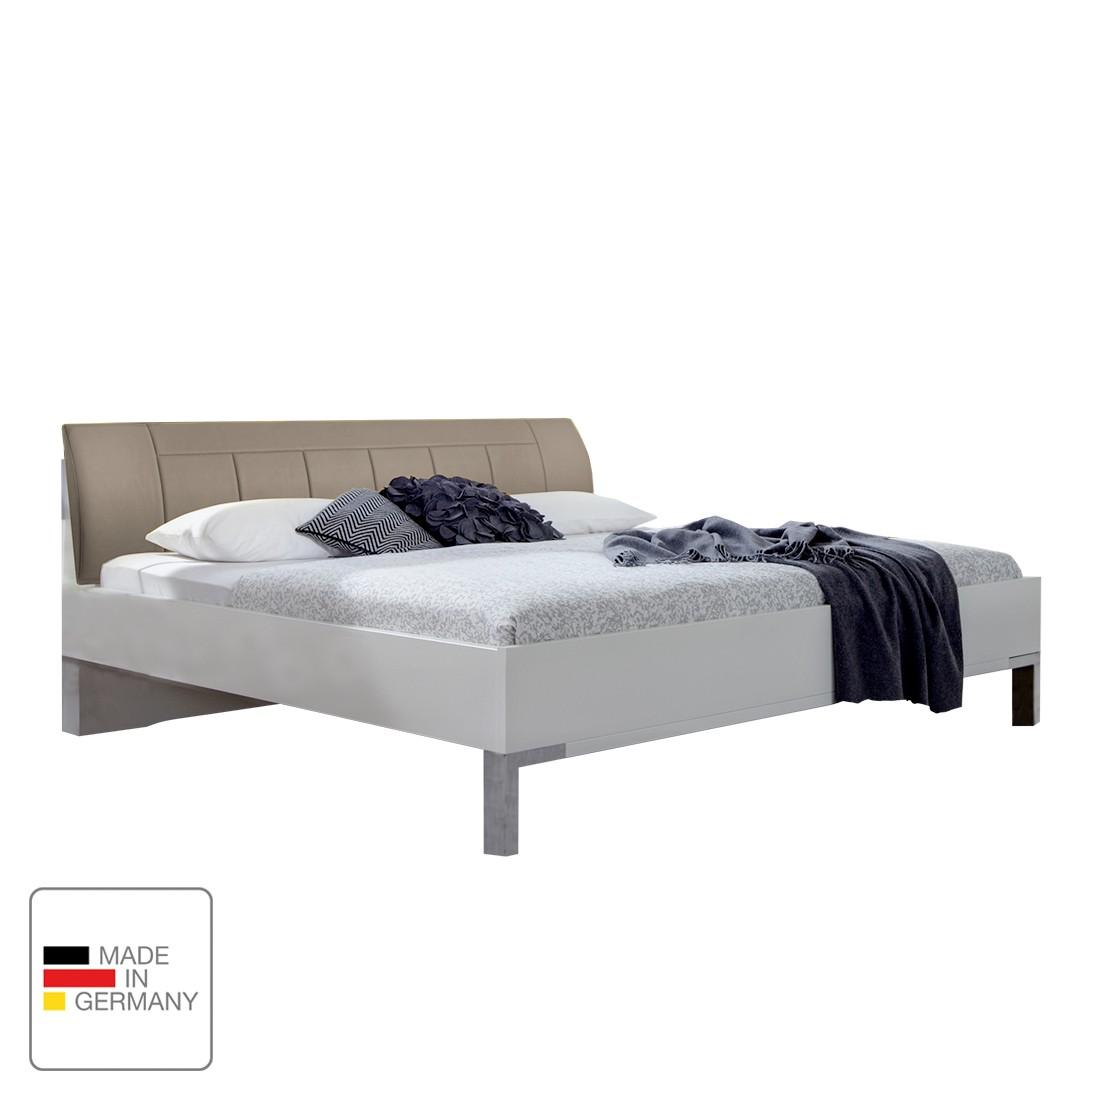 futonbett jive i alpinwei kunstleder sahara 180 x 200cm ohne beleuchtung komforth he. Black Bedroom Furniture Sets. Home Design Ideas